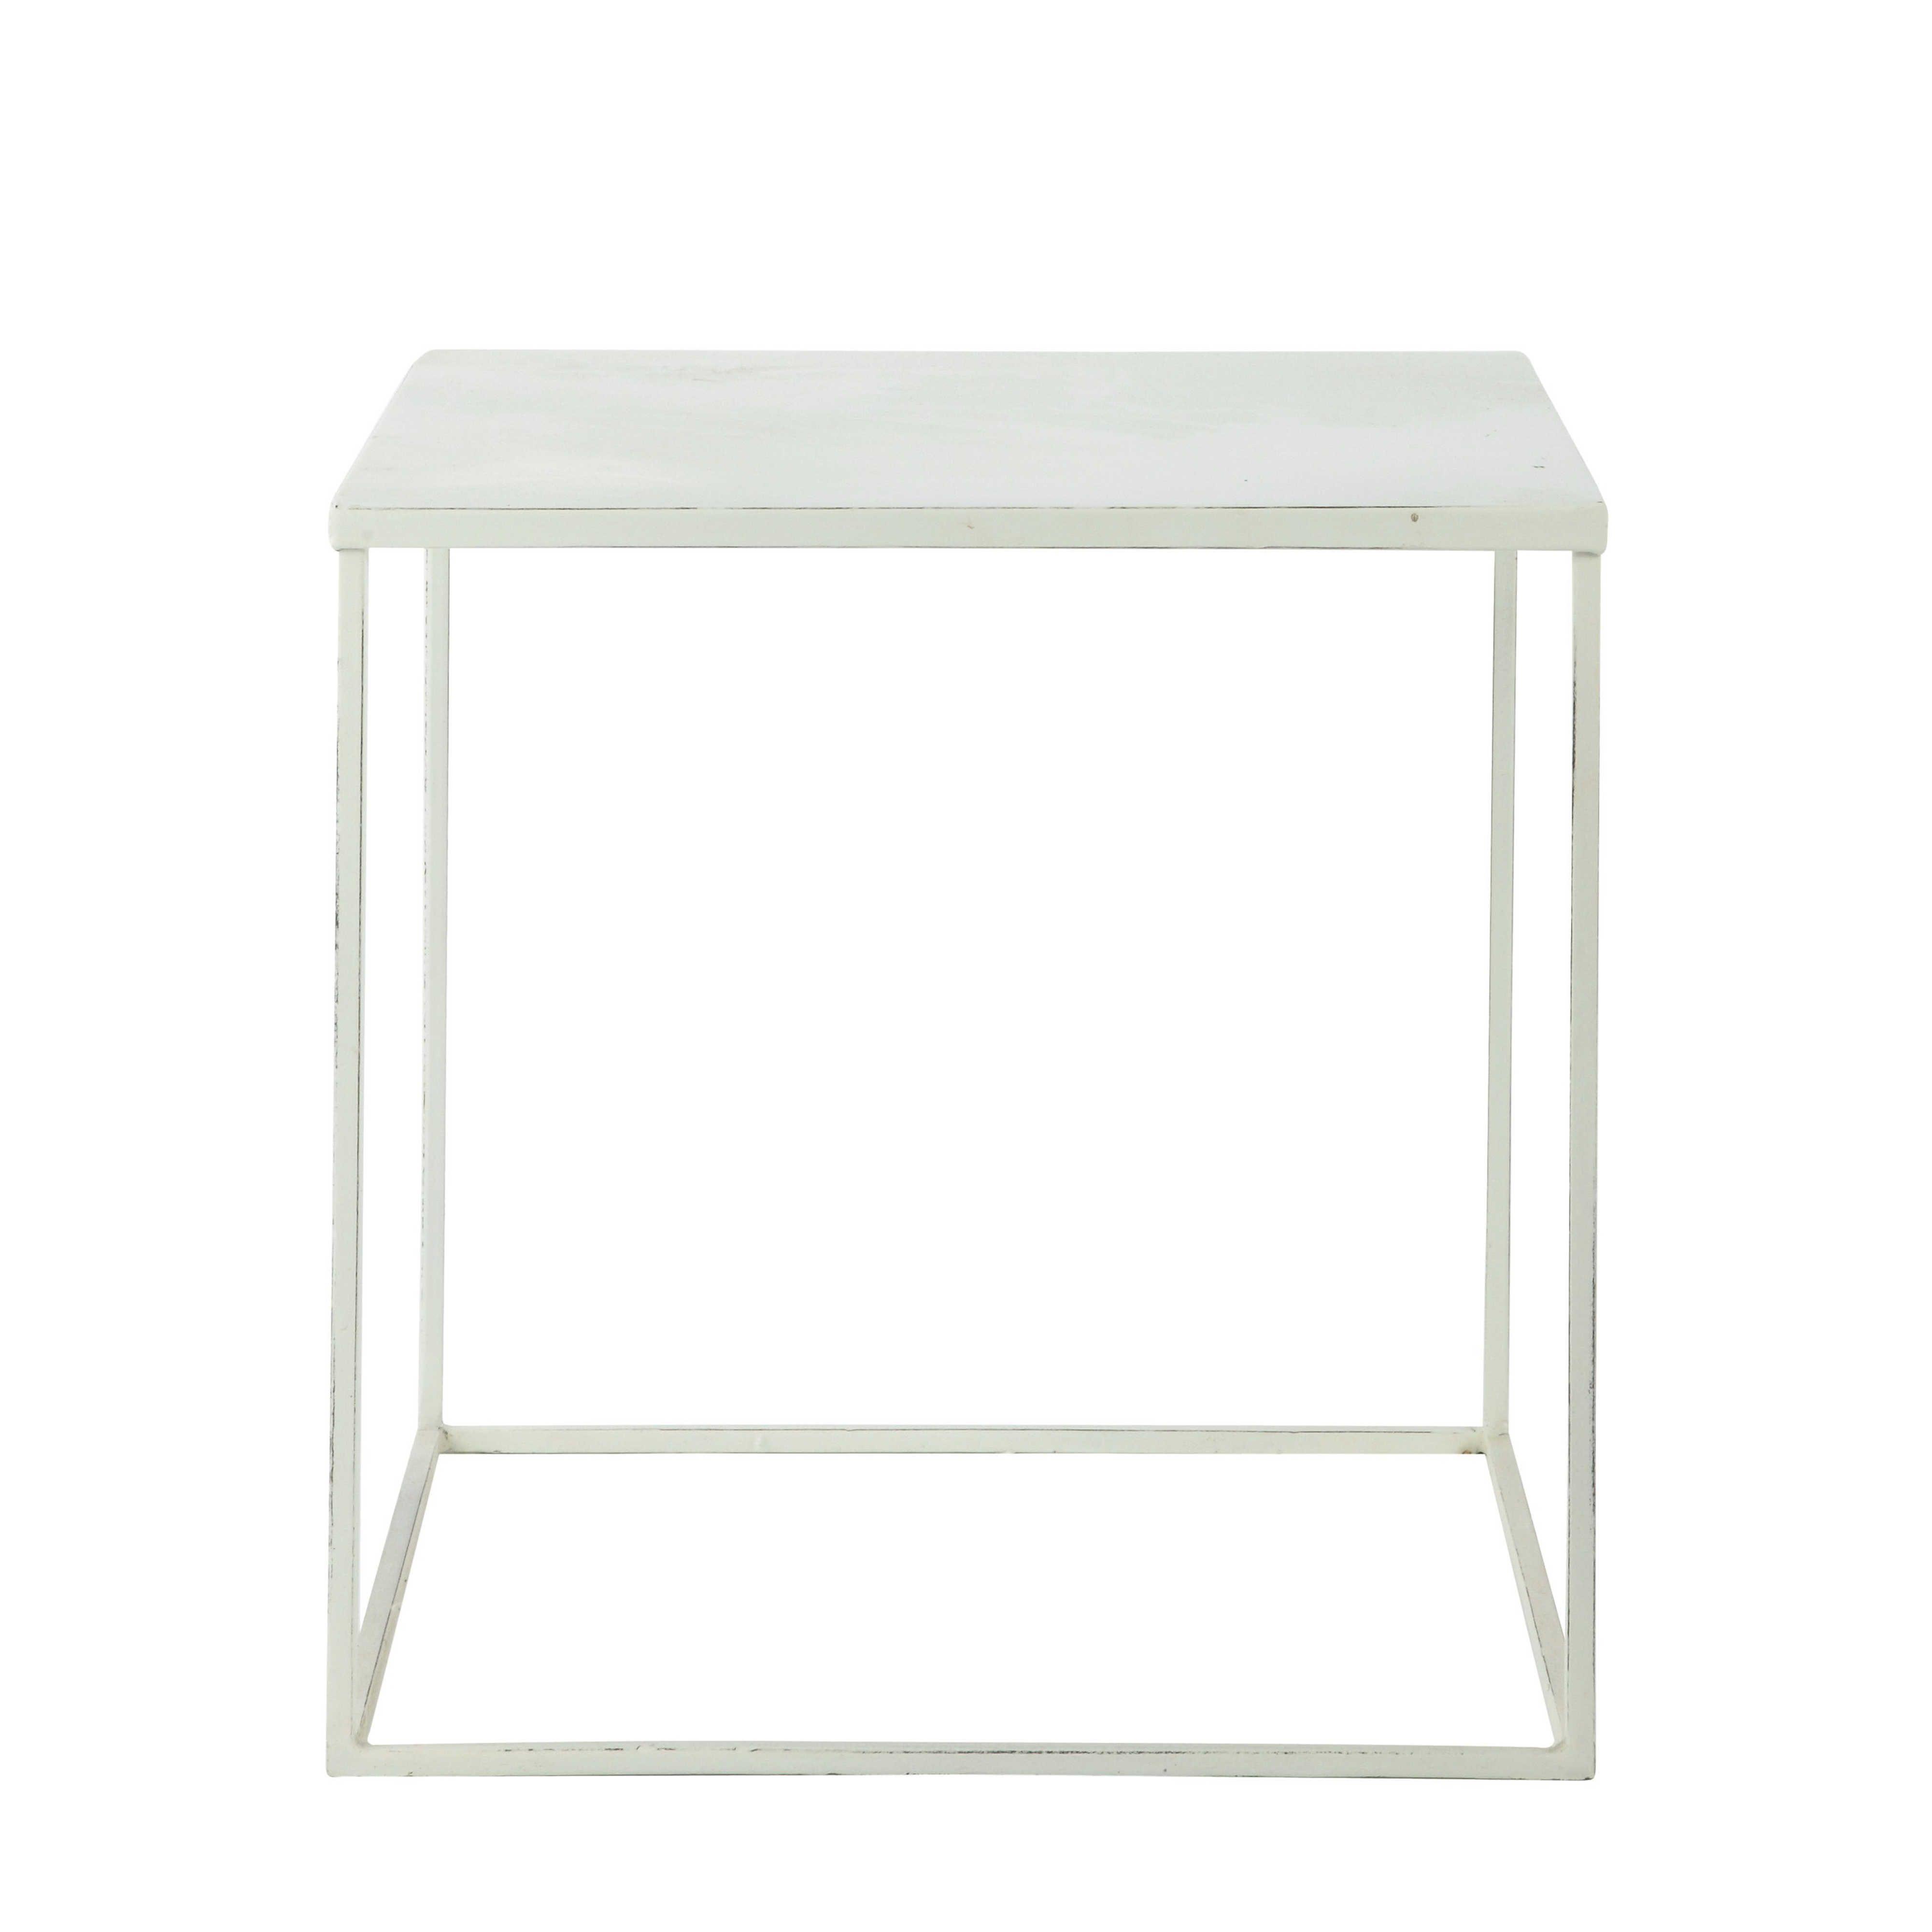 Metal Coffee Table White W 45cm Bloom Maisons Du Monde Metal Coffee Table Table Coffee Table White